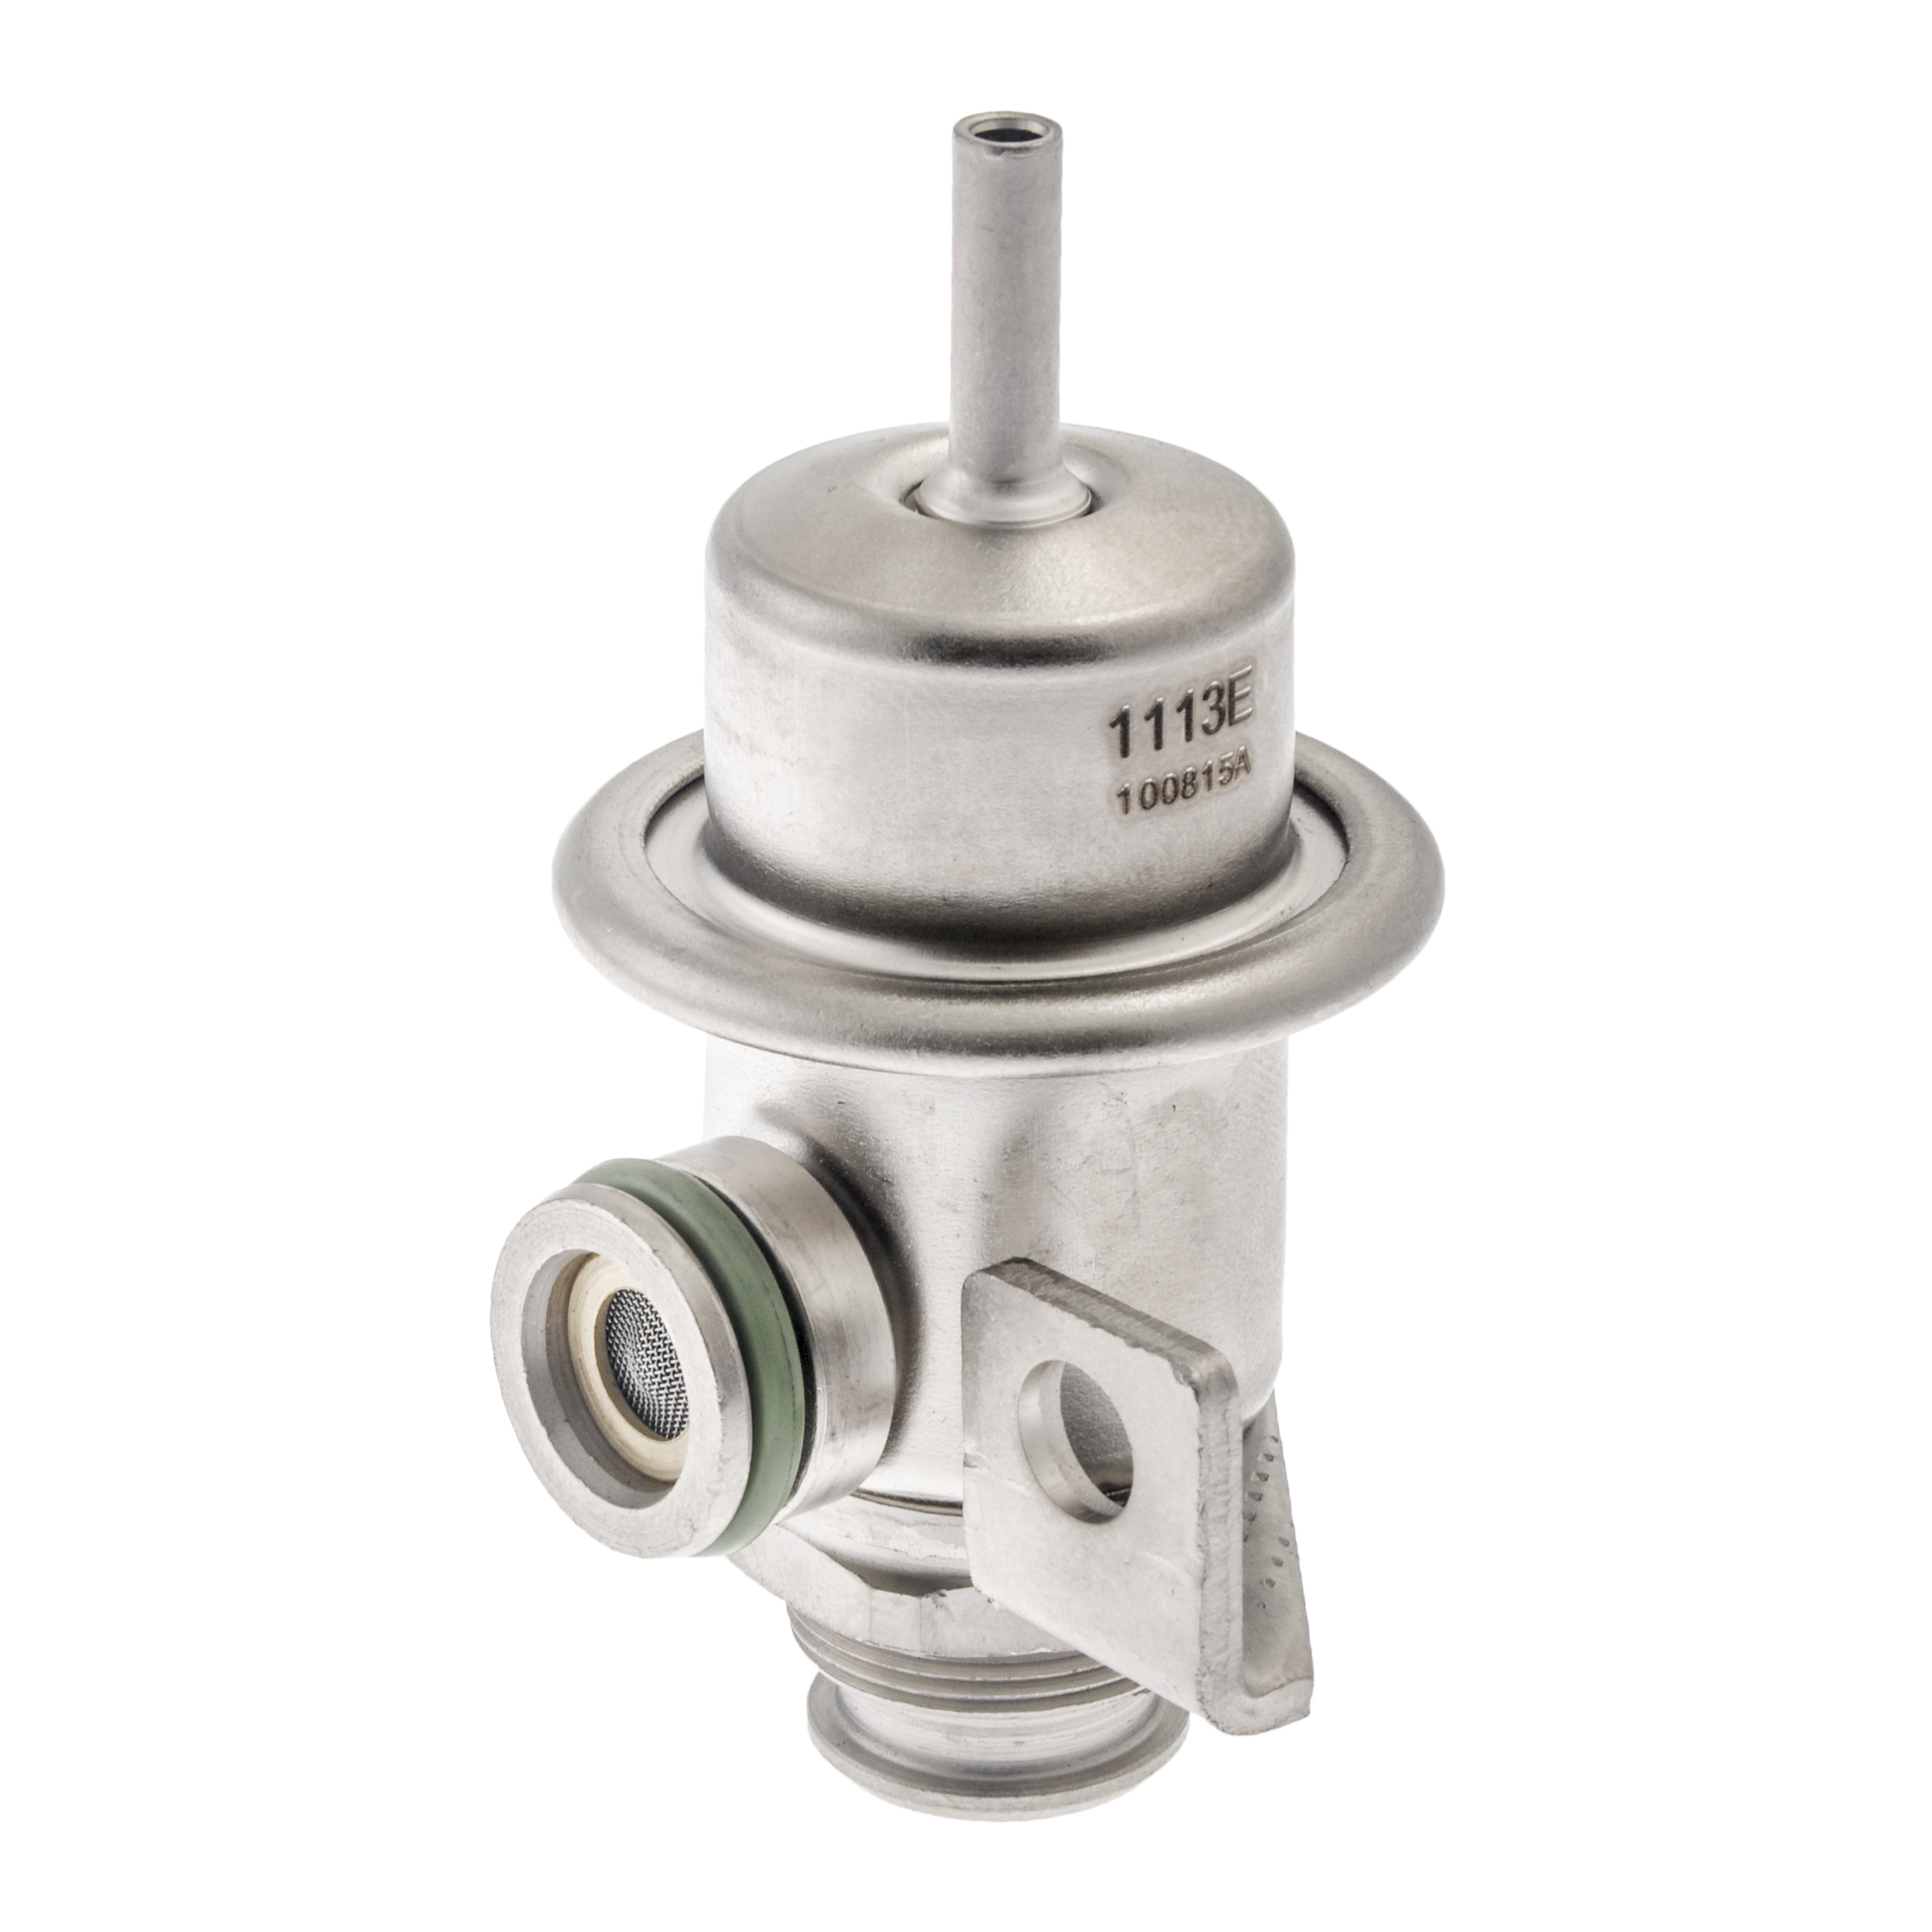 Herko Fuel Pressure Regulator PR4089 For Buick Chevrolet GMC Isuzu 02-05 4 Bar